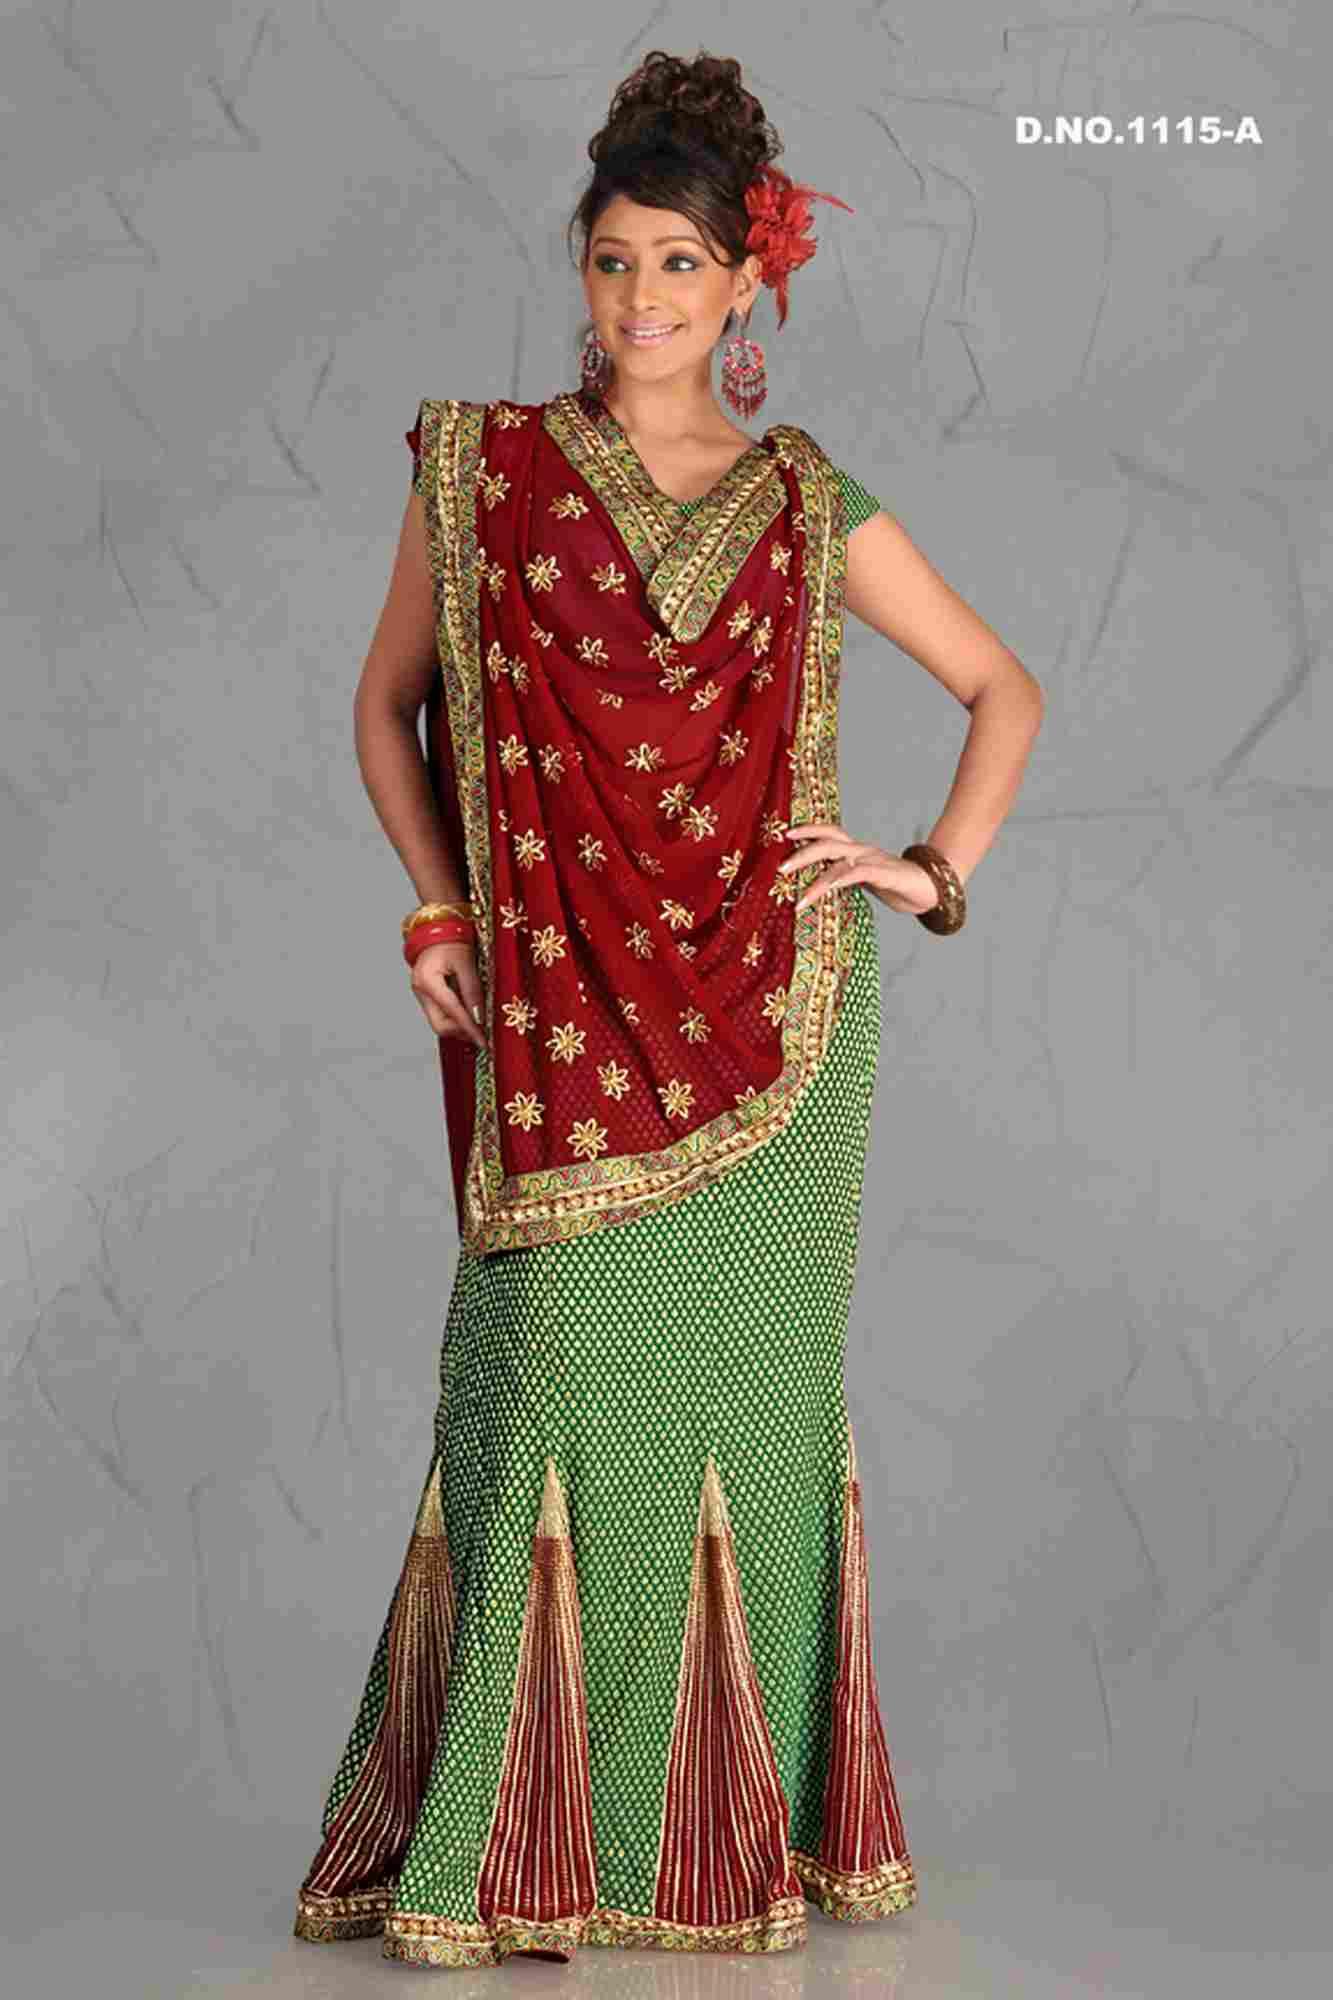 Archana Trend Setter Lehenga Choli Style Georgette Sari  Saree